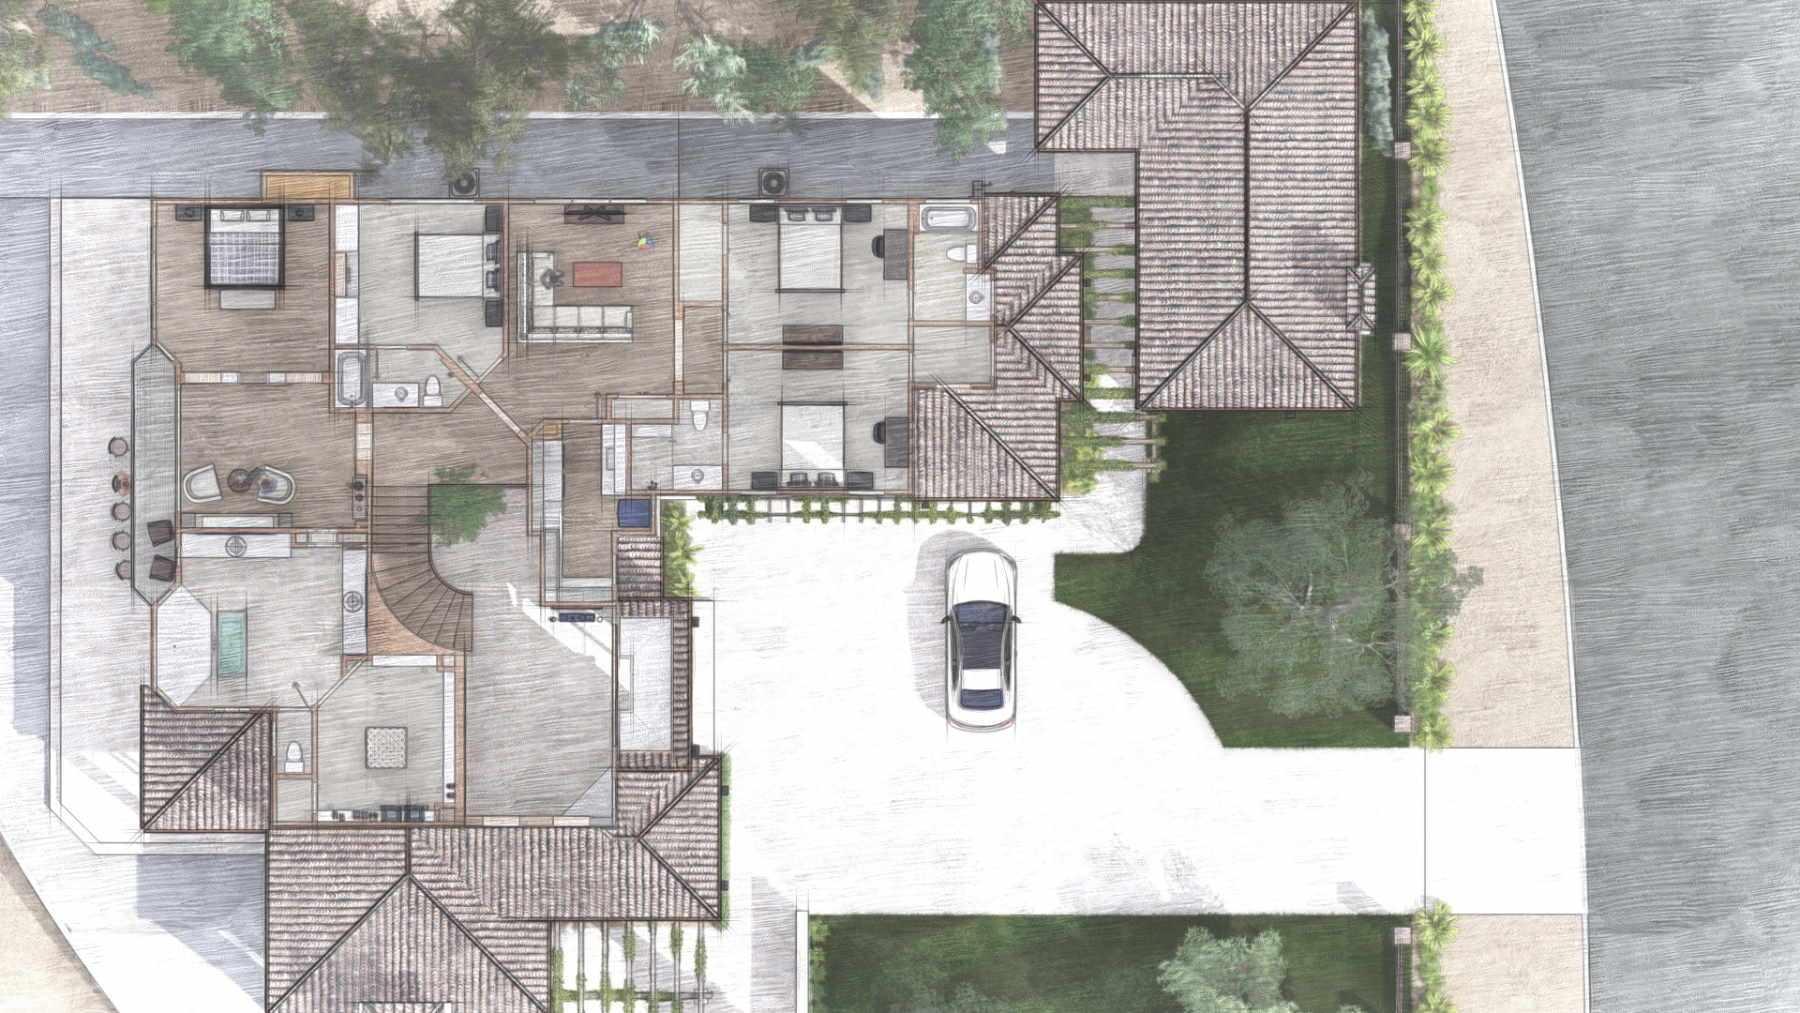 Floorplan view of house